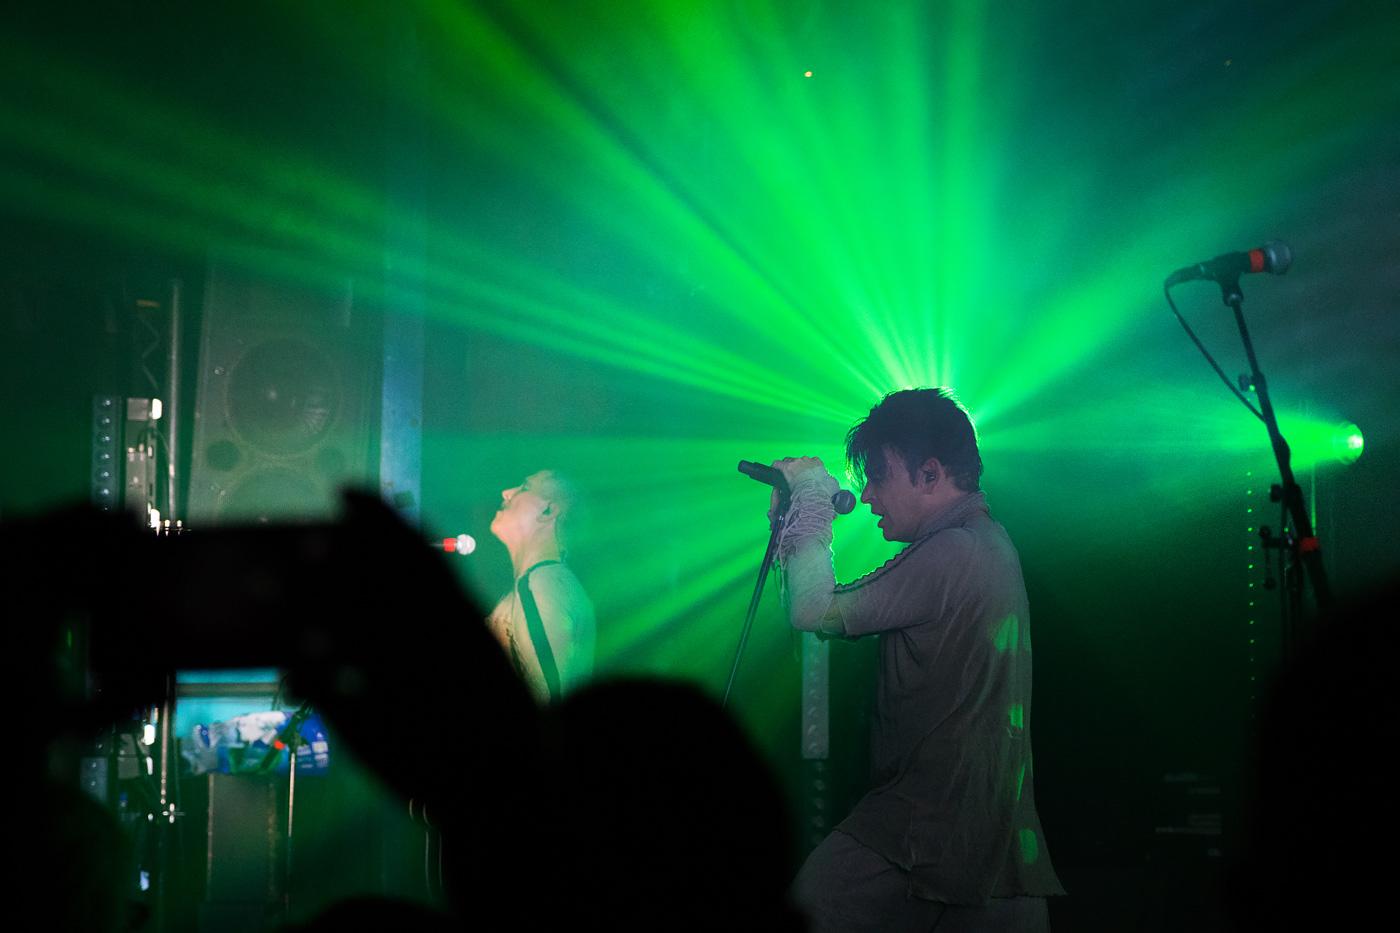 Gary Numan Concert Photos 2017 - Denver Gothic Theatre